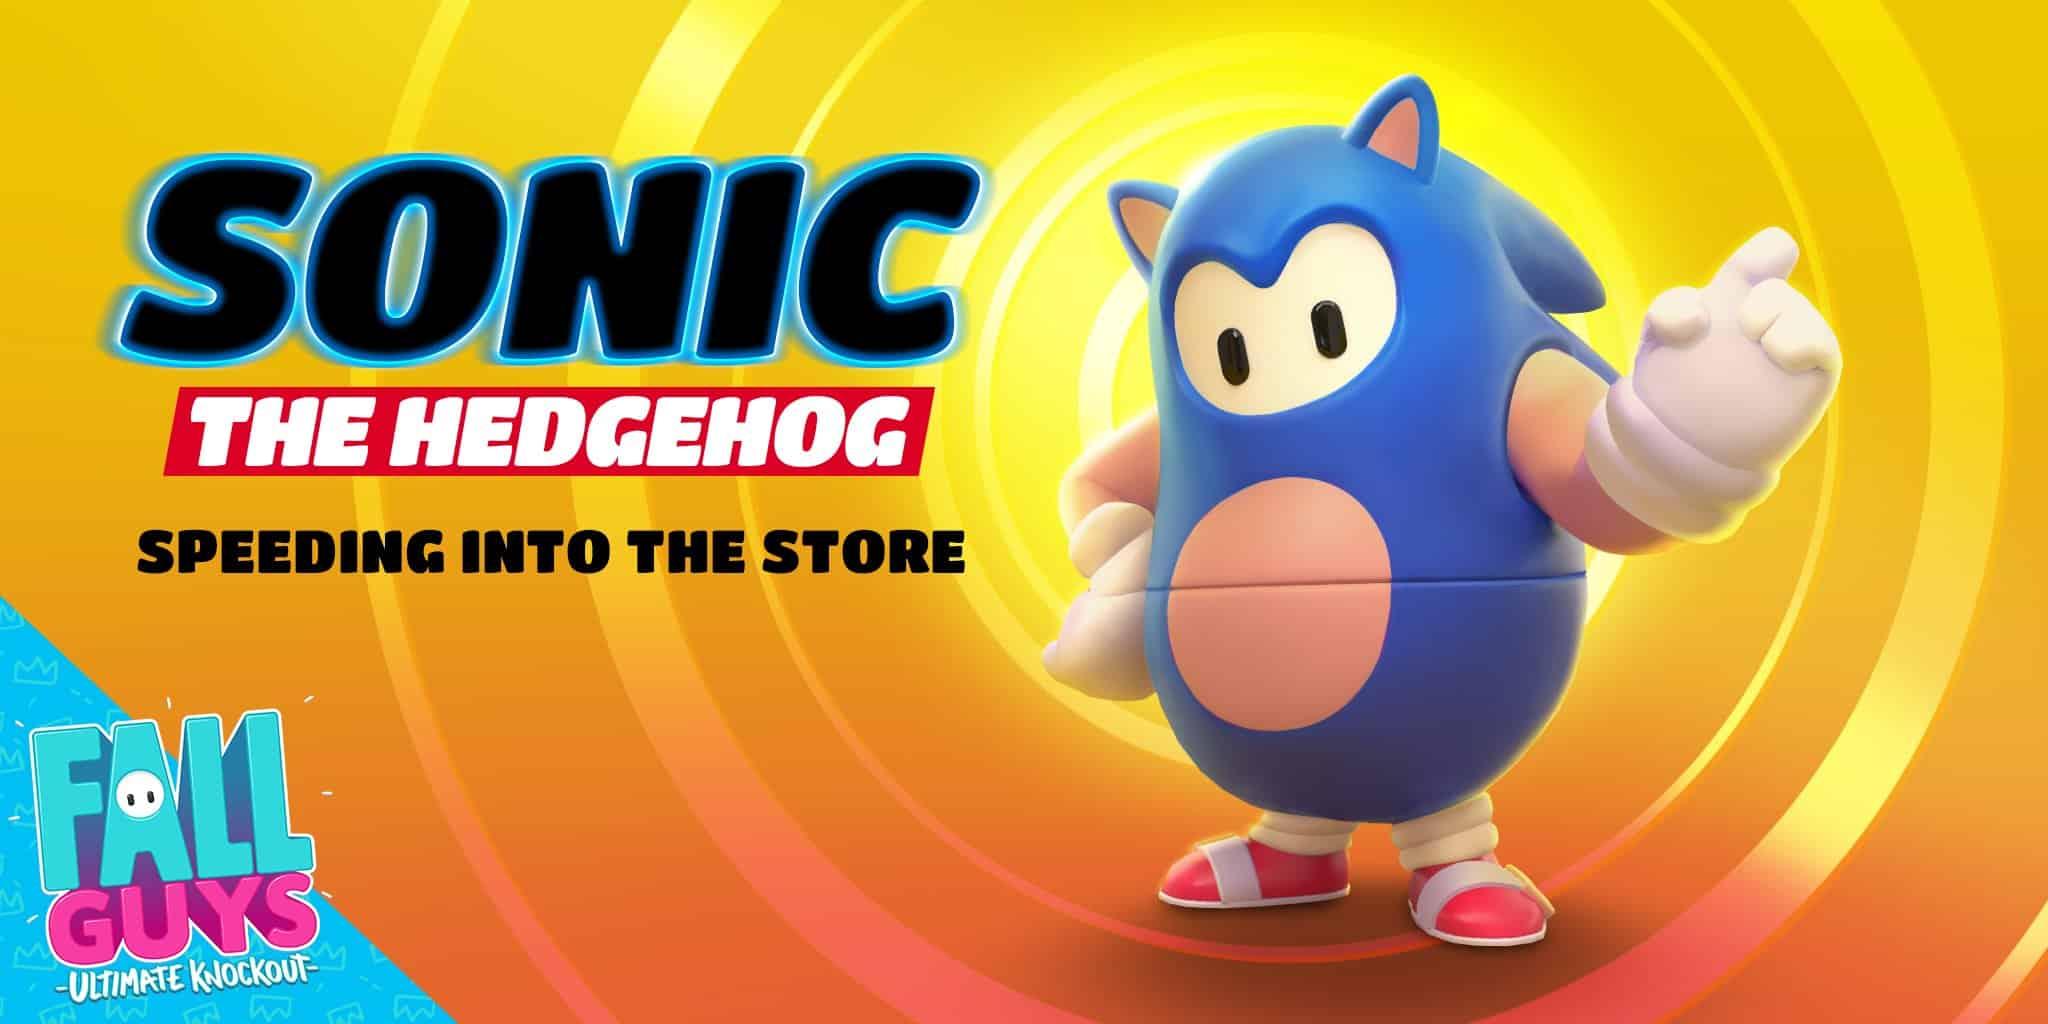 Sonic Fall Guys Sonic the Hedgehog Fall Guys: Ultimate Knockout Sega Mediatonic